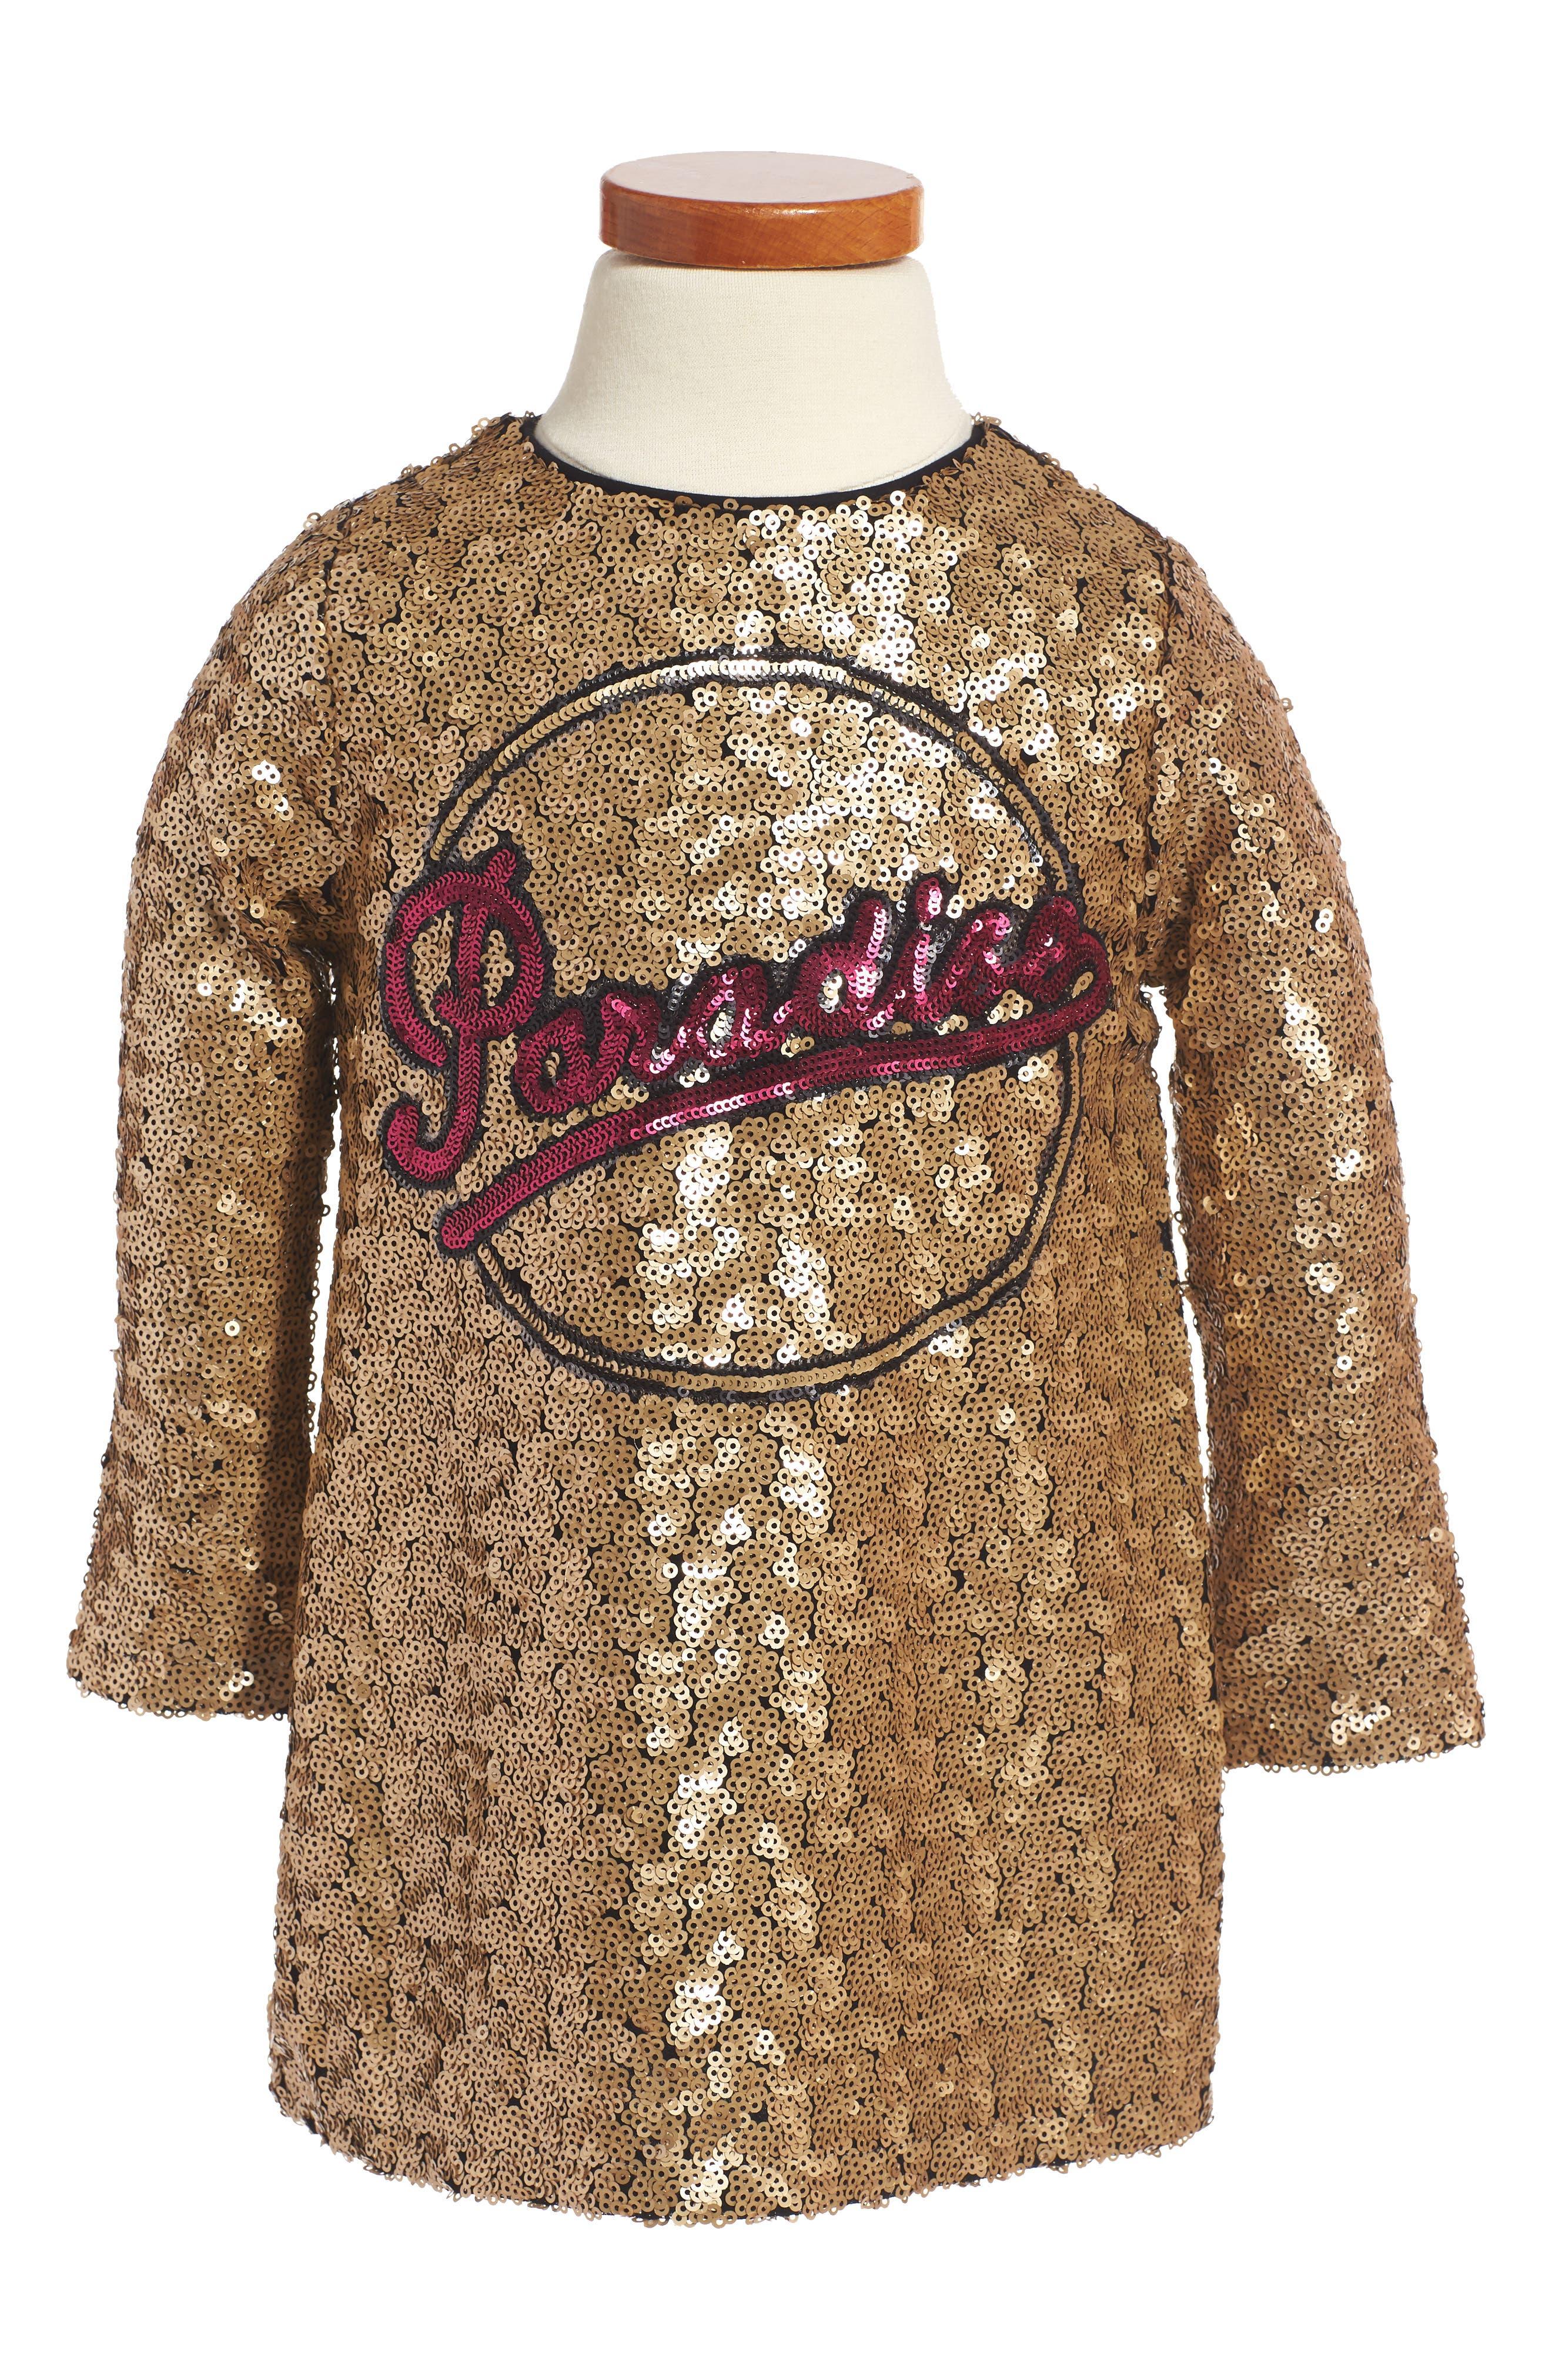 Main Image - LITTLE MARC JACOBS Paradise Sequin Shift Dress (Toddler Girls, Little Girls & Big Girls)